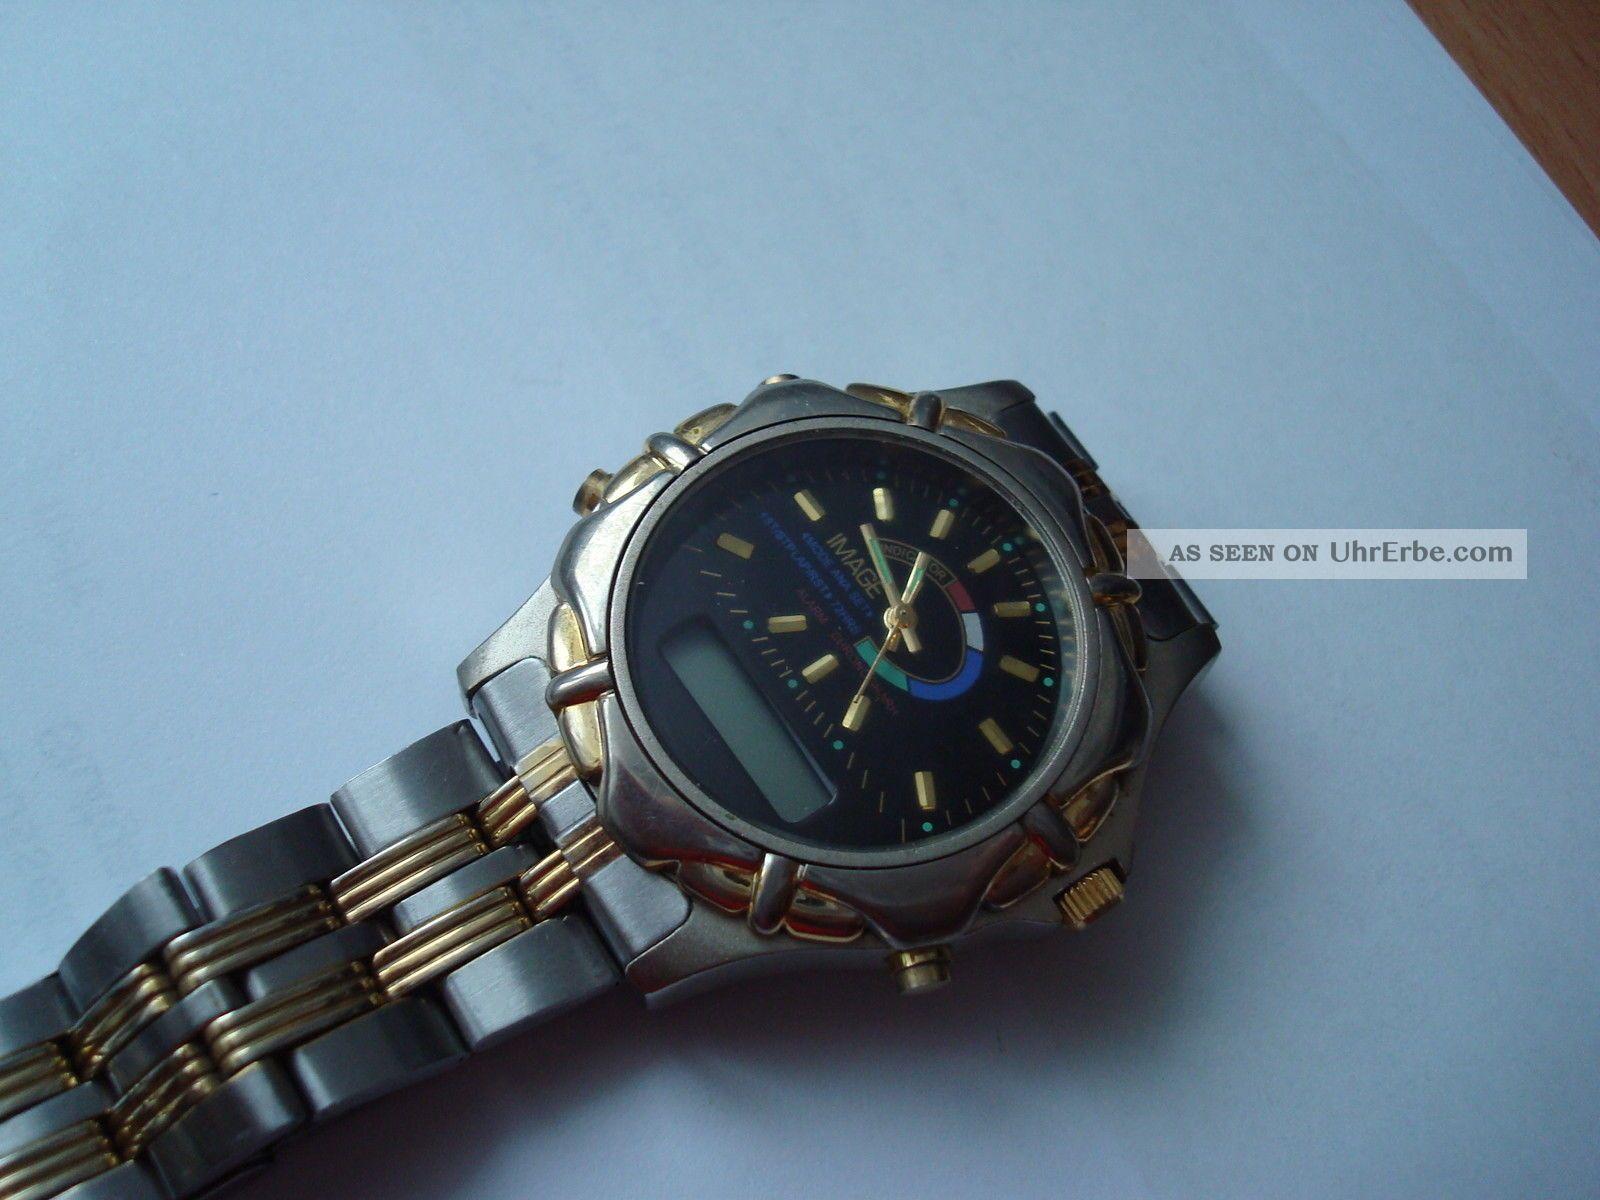 Sammlerstück Armbanduhr,  Analoge - Digitale Anzeige,  Quarz - Ansehen - Armbanduhren Bild